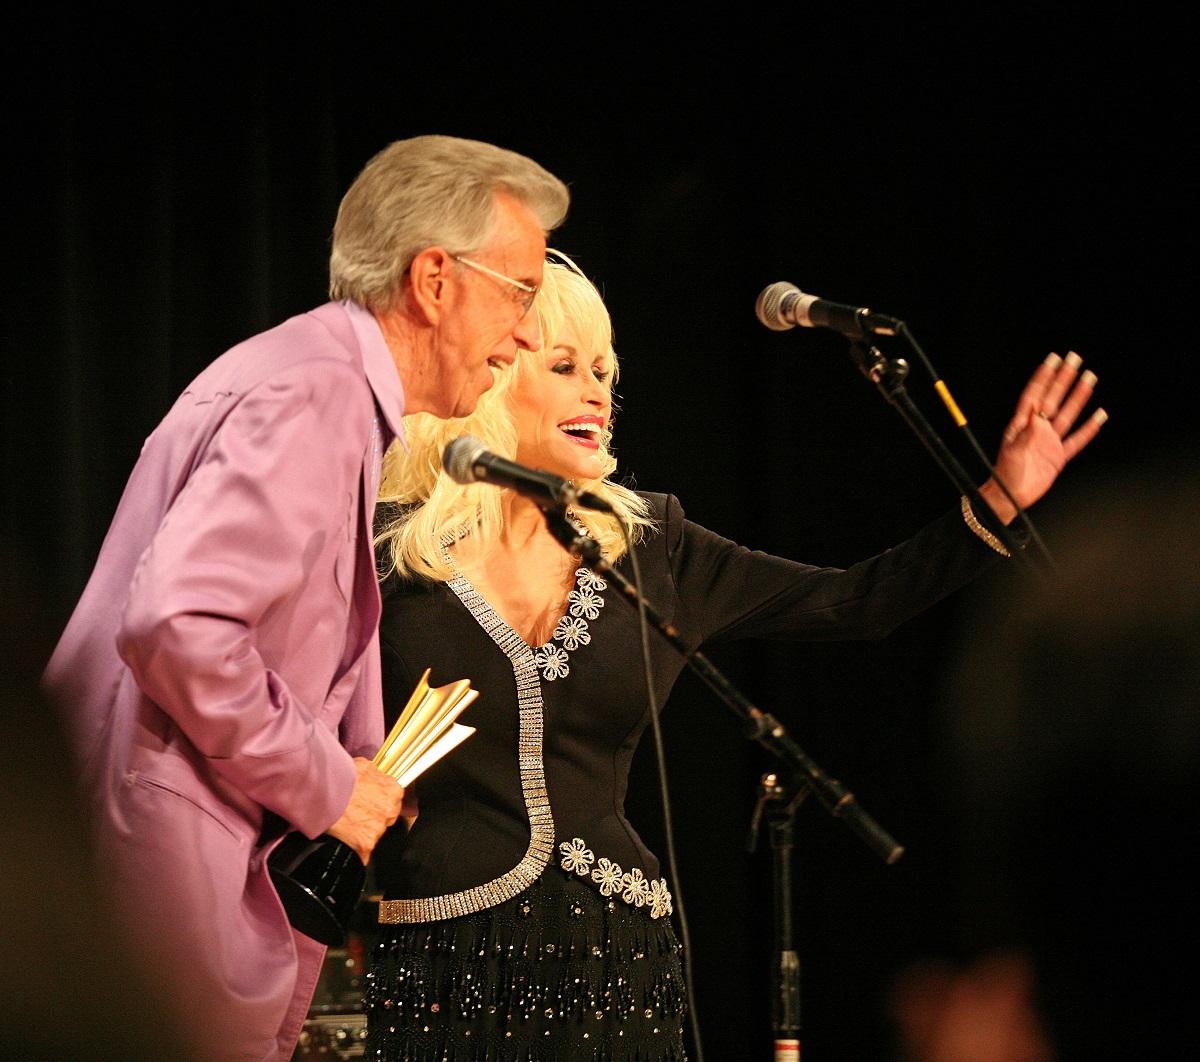 Porter Wagoner et Dolly Parton en 2007